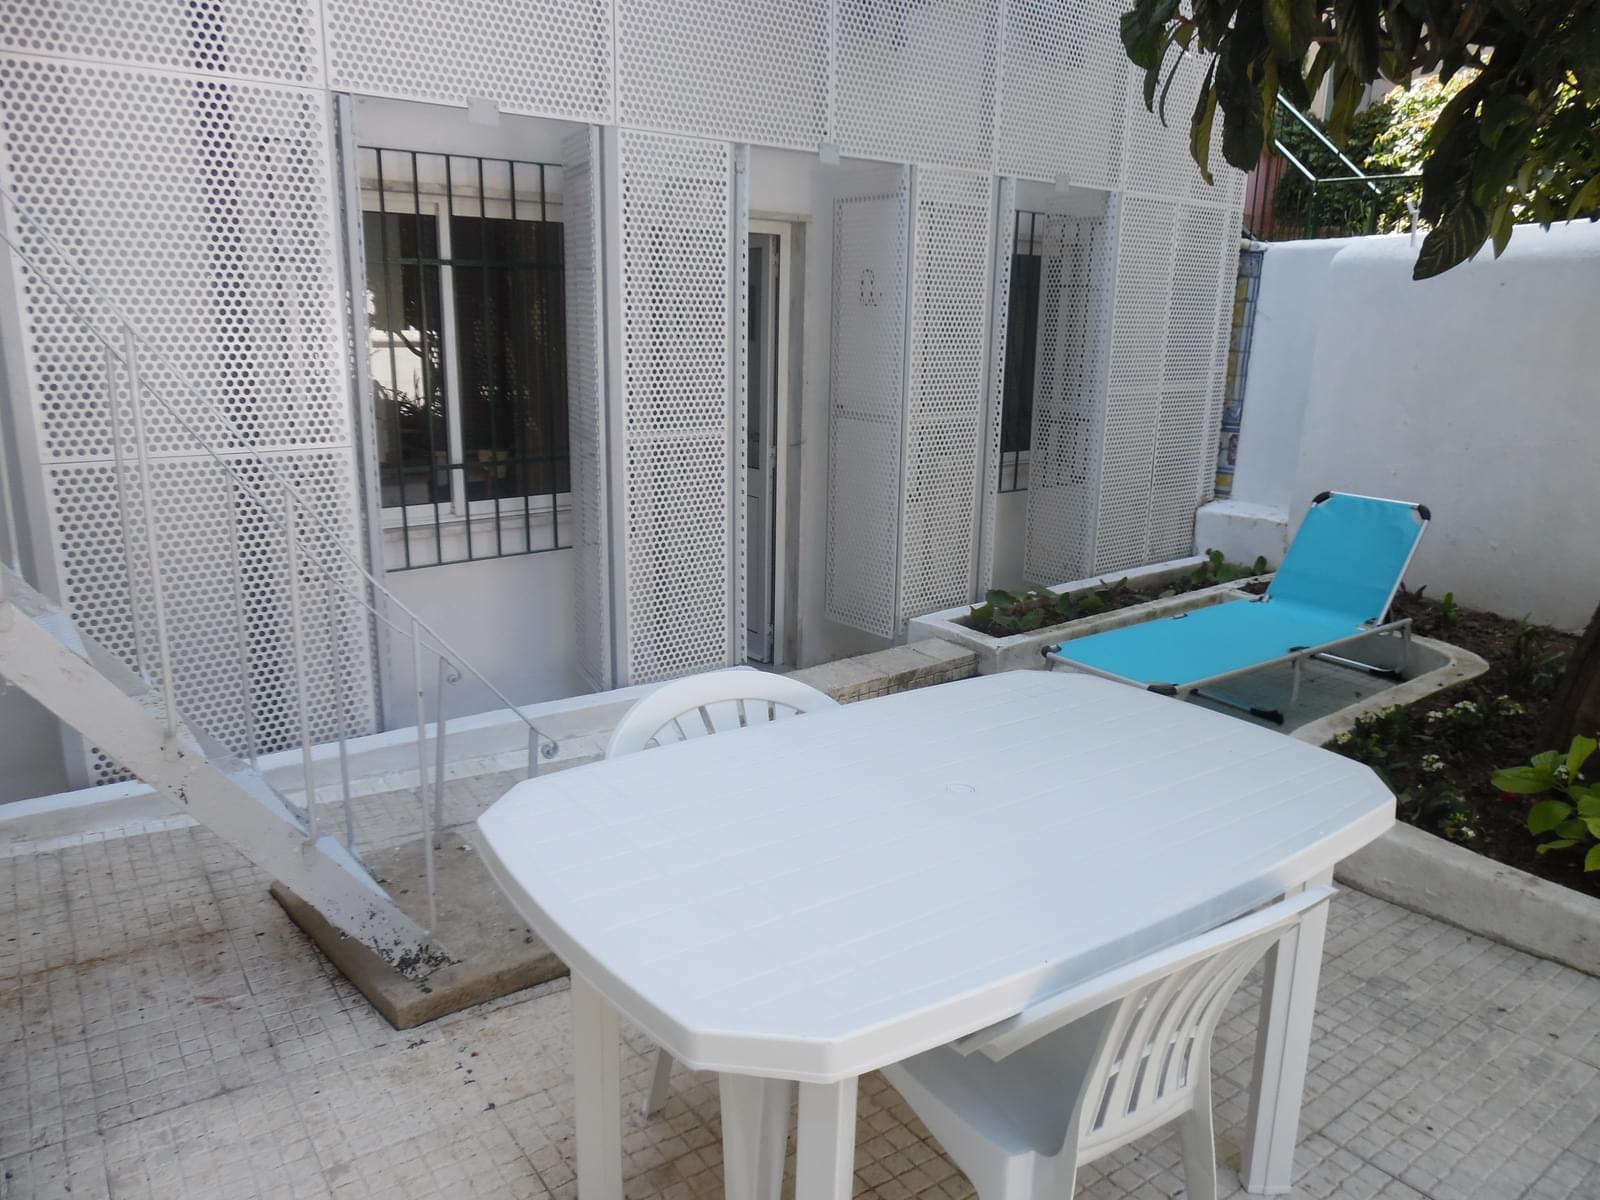 pf17147-apartamento-t2-lisboa-673e3a35-2885-4437-8587-23005e5141d3